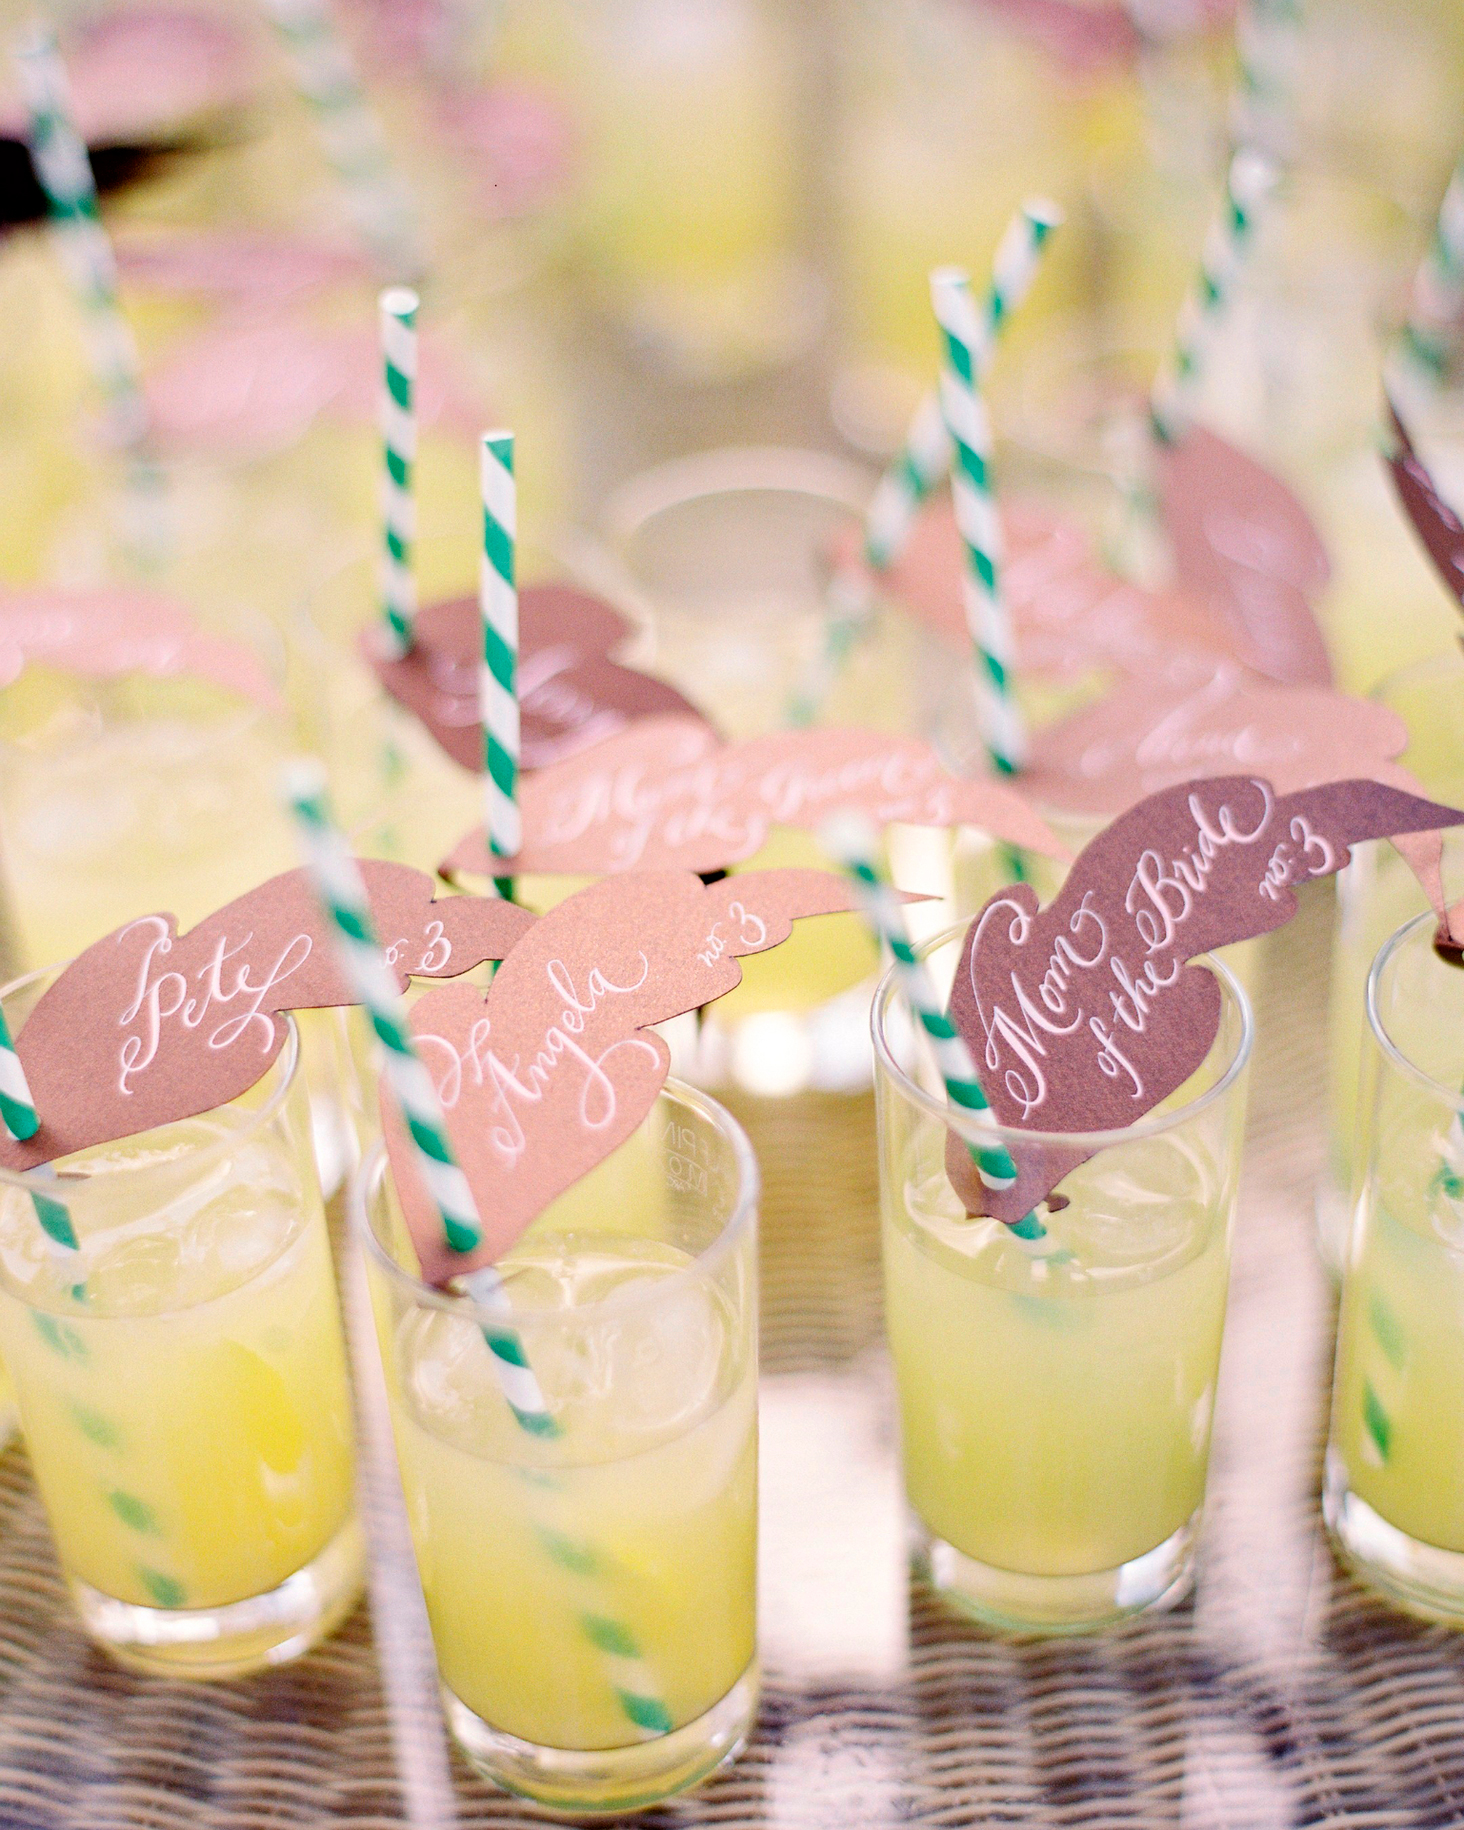 lara-oliver-champagne-312.jpg